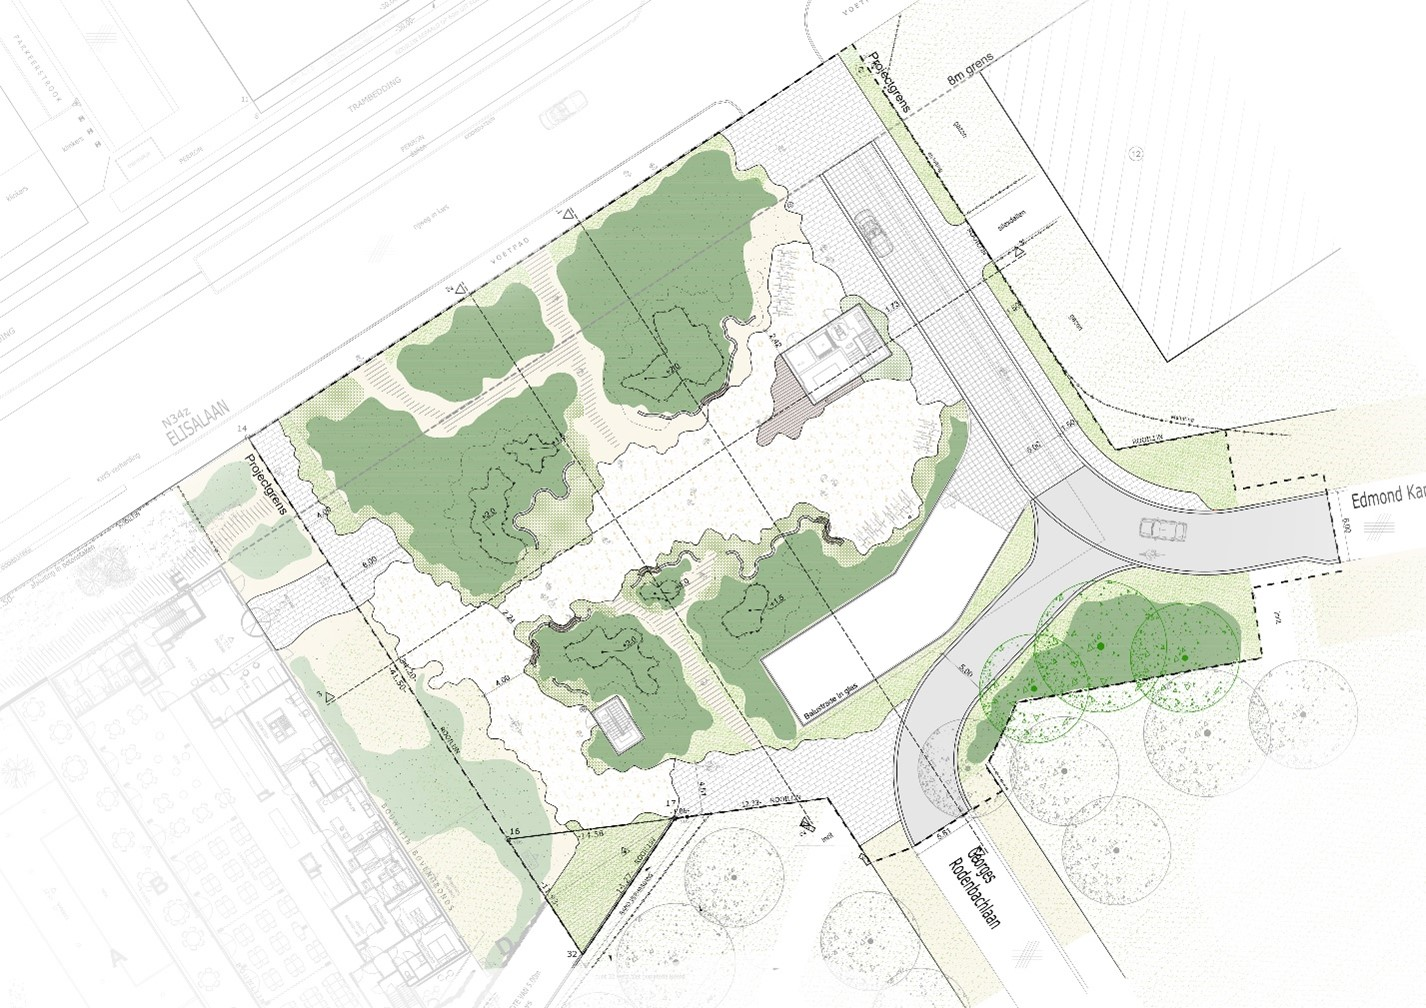 D+A_studiebureau_infra_Nieuwpoort_Nieuwlandplein_grondplan